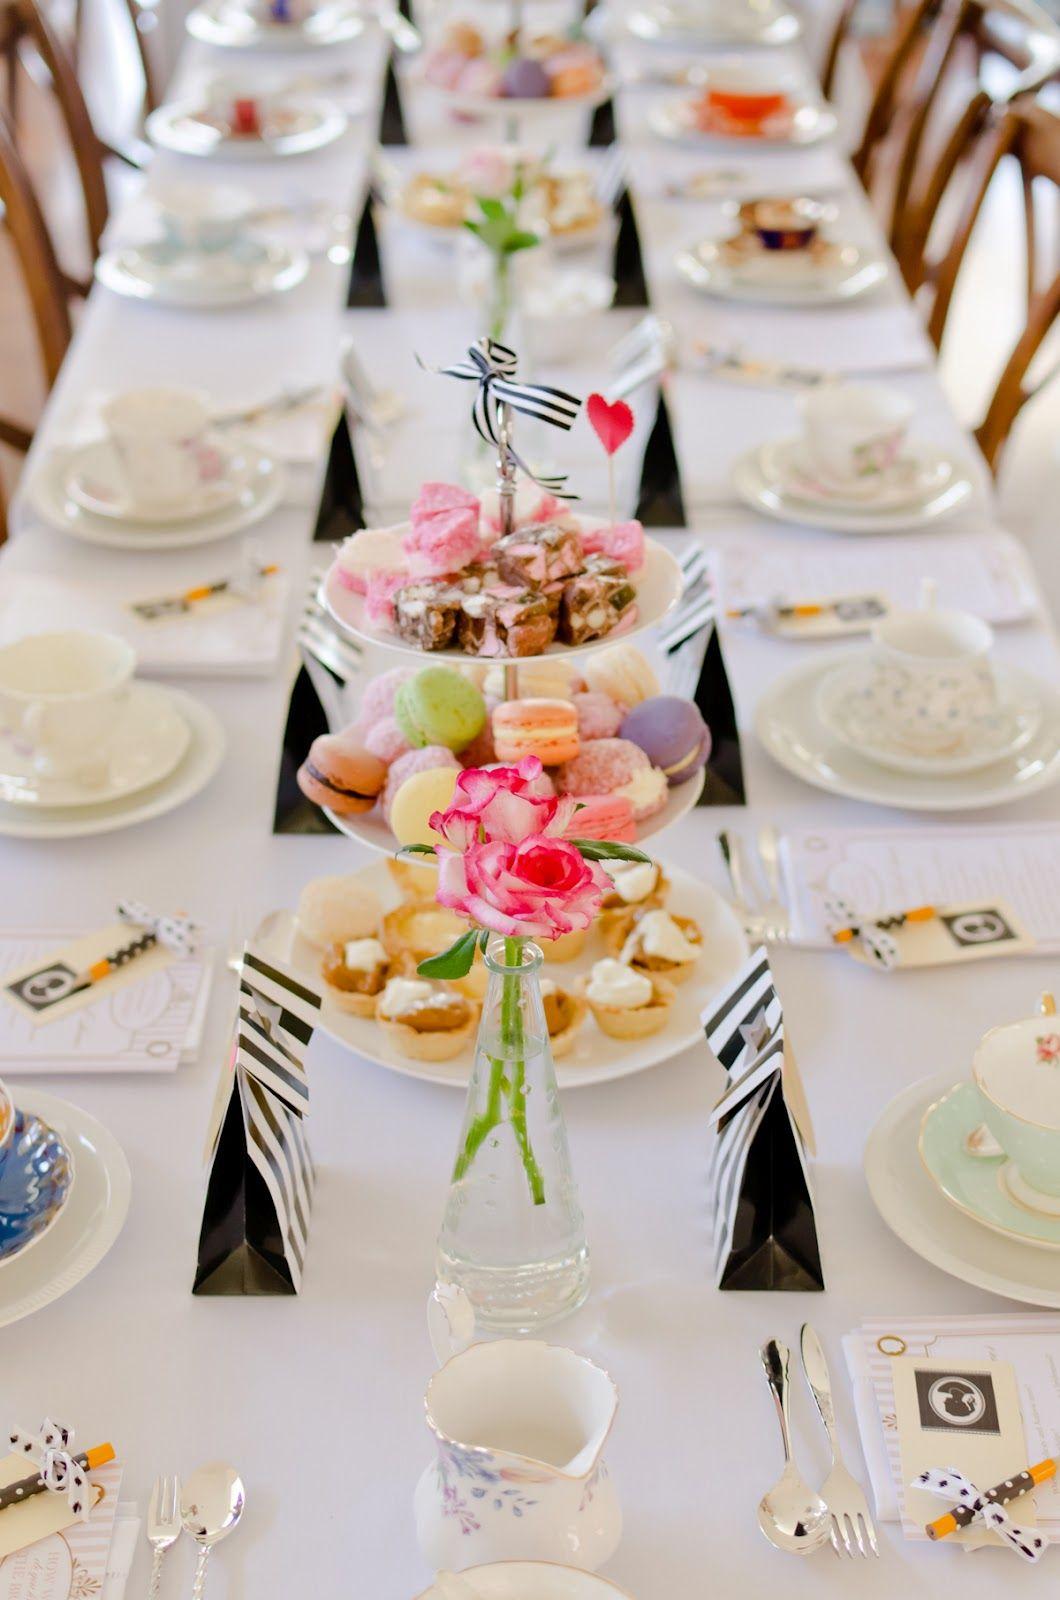 Lady Chatterley's Affair Bridal Shower High Tea Style